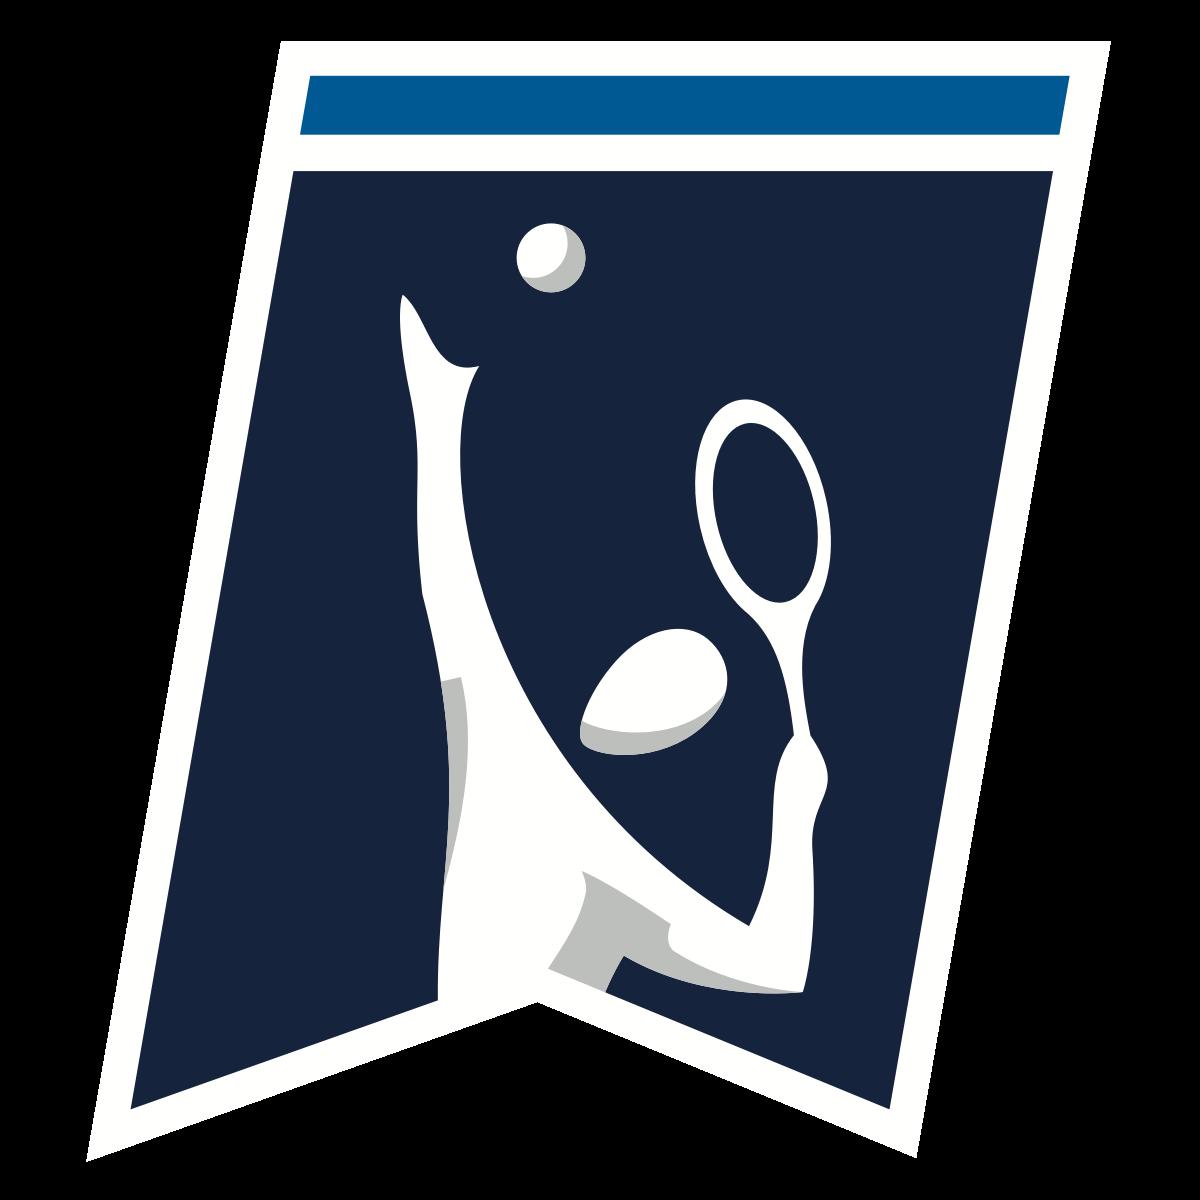 2018 DI Women's Tennis Championship